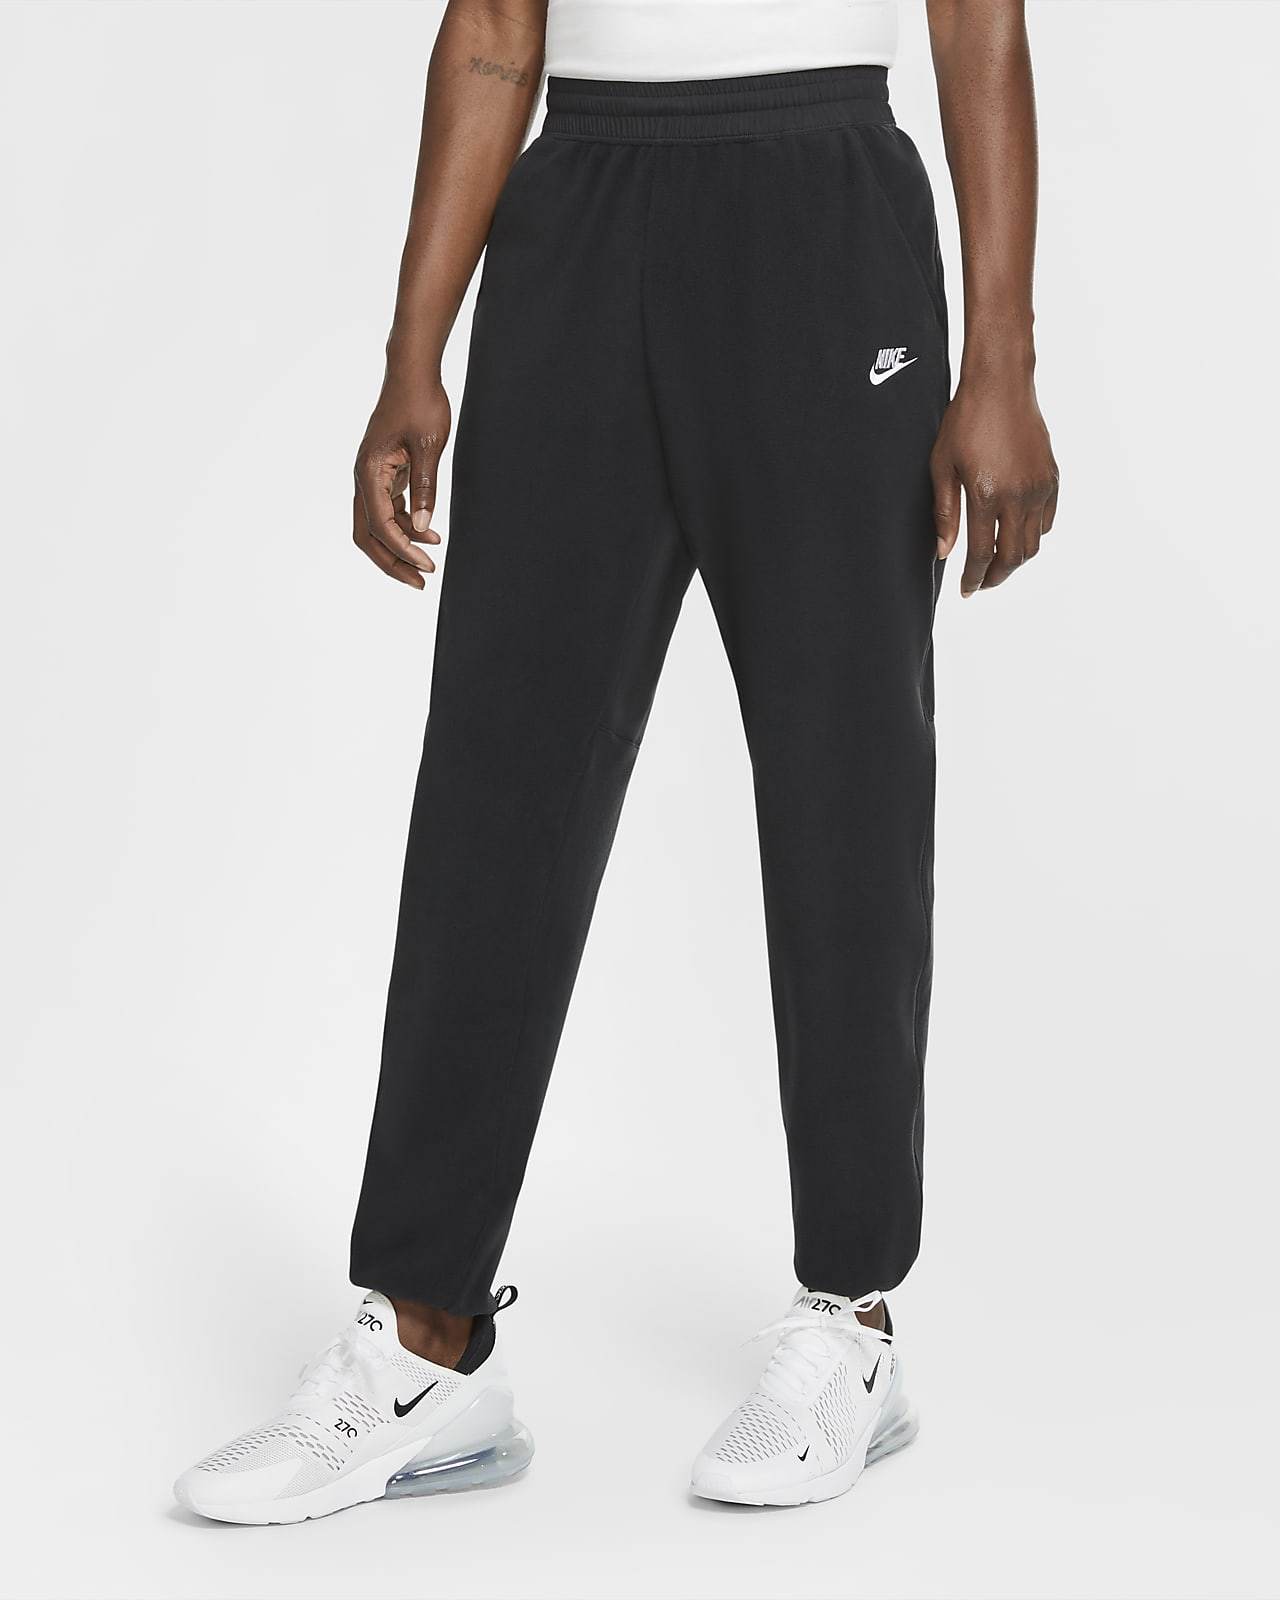 Nike tepláky Nike Sportswear Ce Pant black Velikost: 2XL